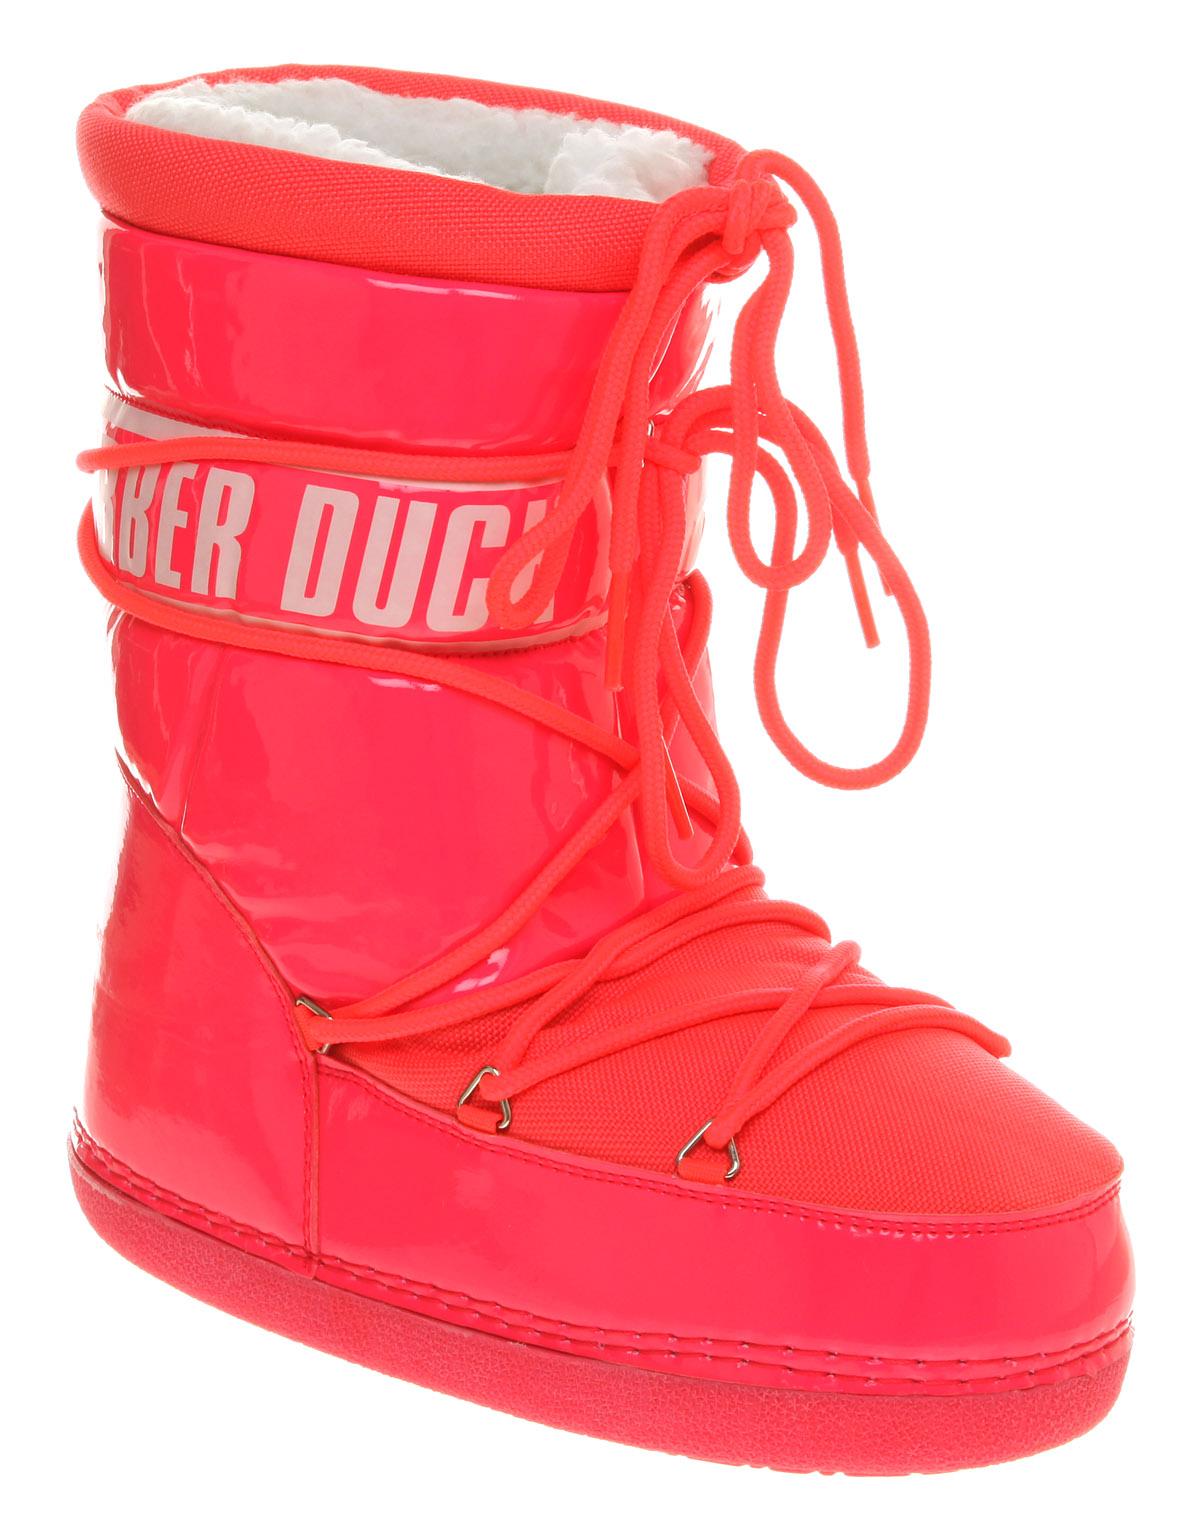 Moon boots rubber duck